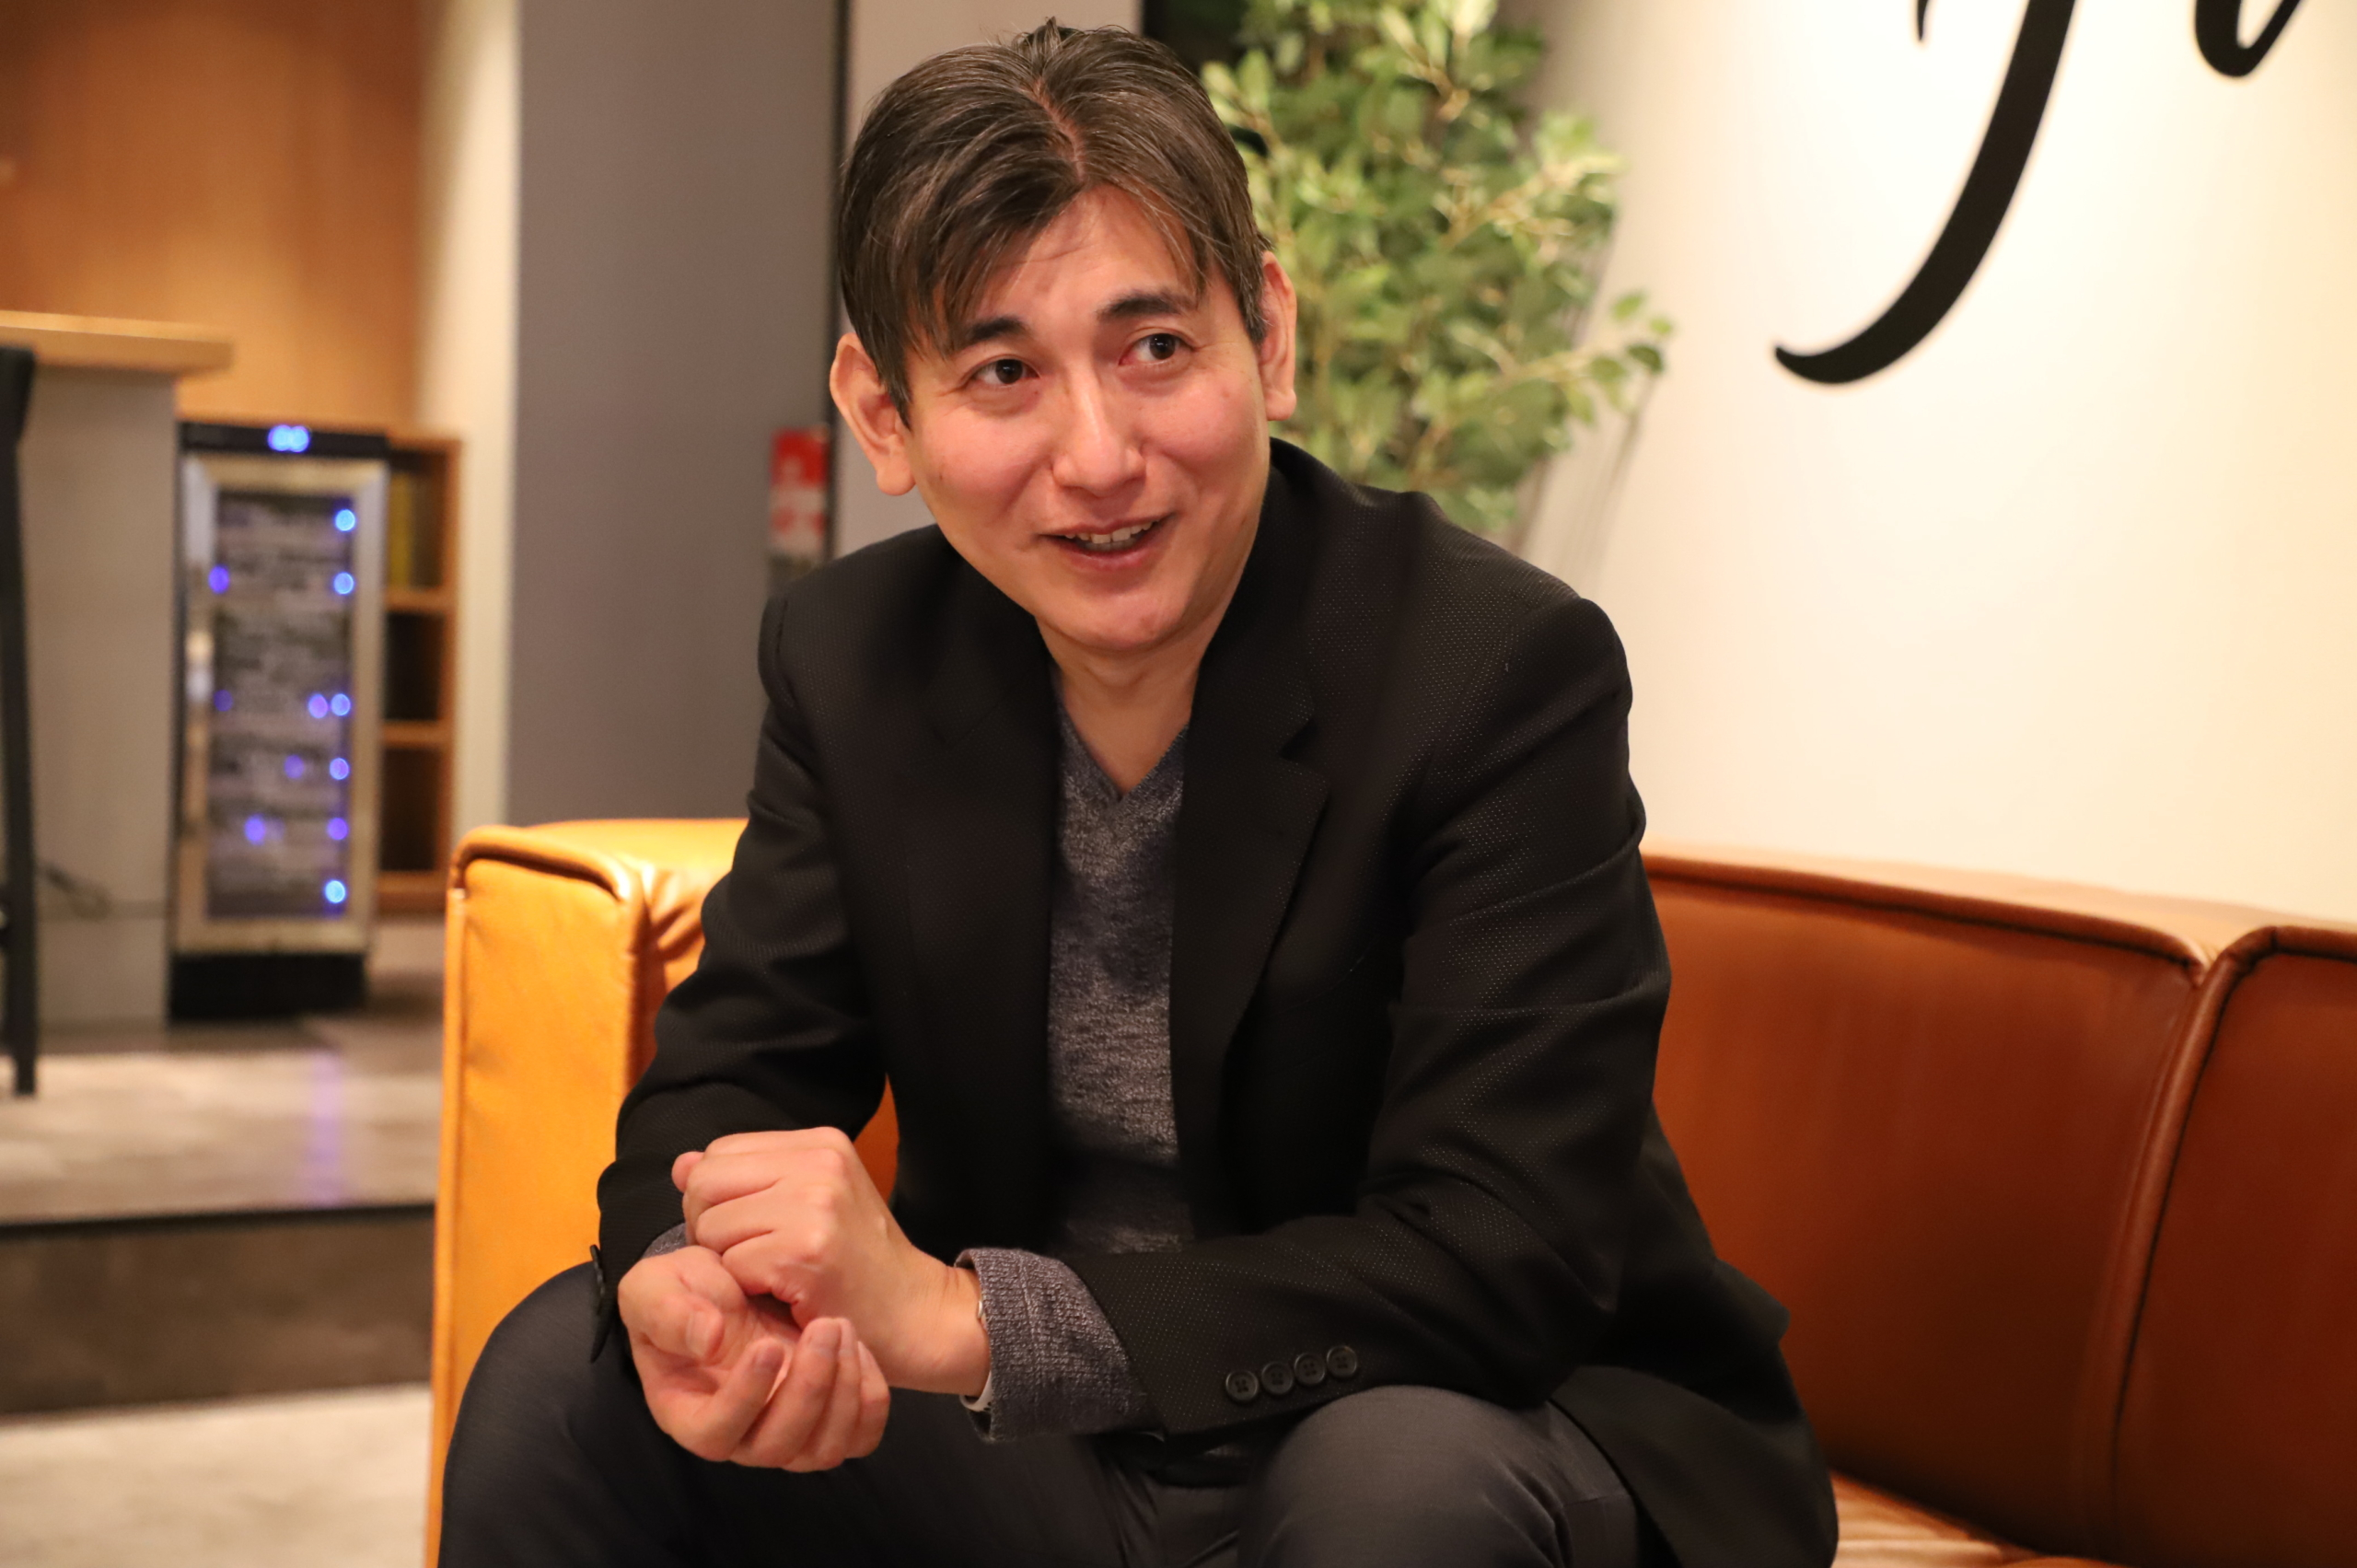 「PayPayのパターンは信長の楽市・楽座と同じ」美崎栄一郎氏がみる今後のキャッシュレス